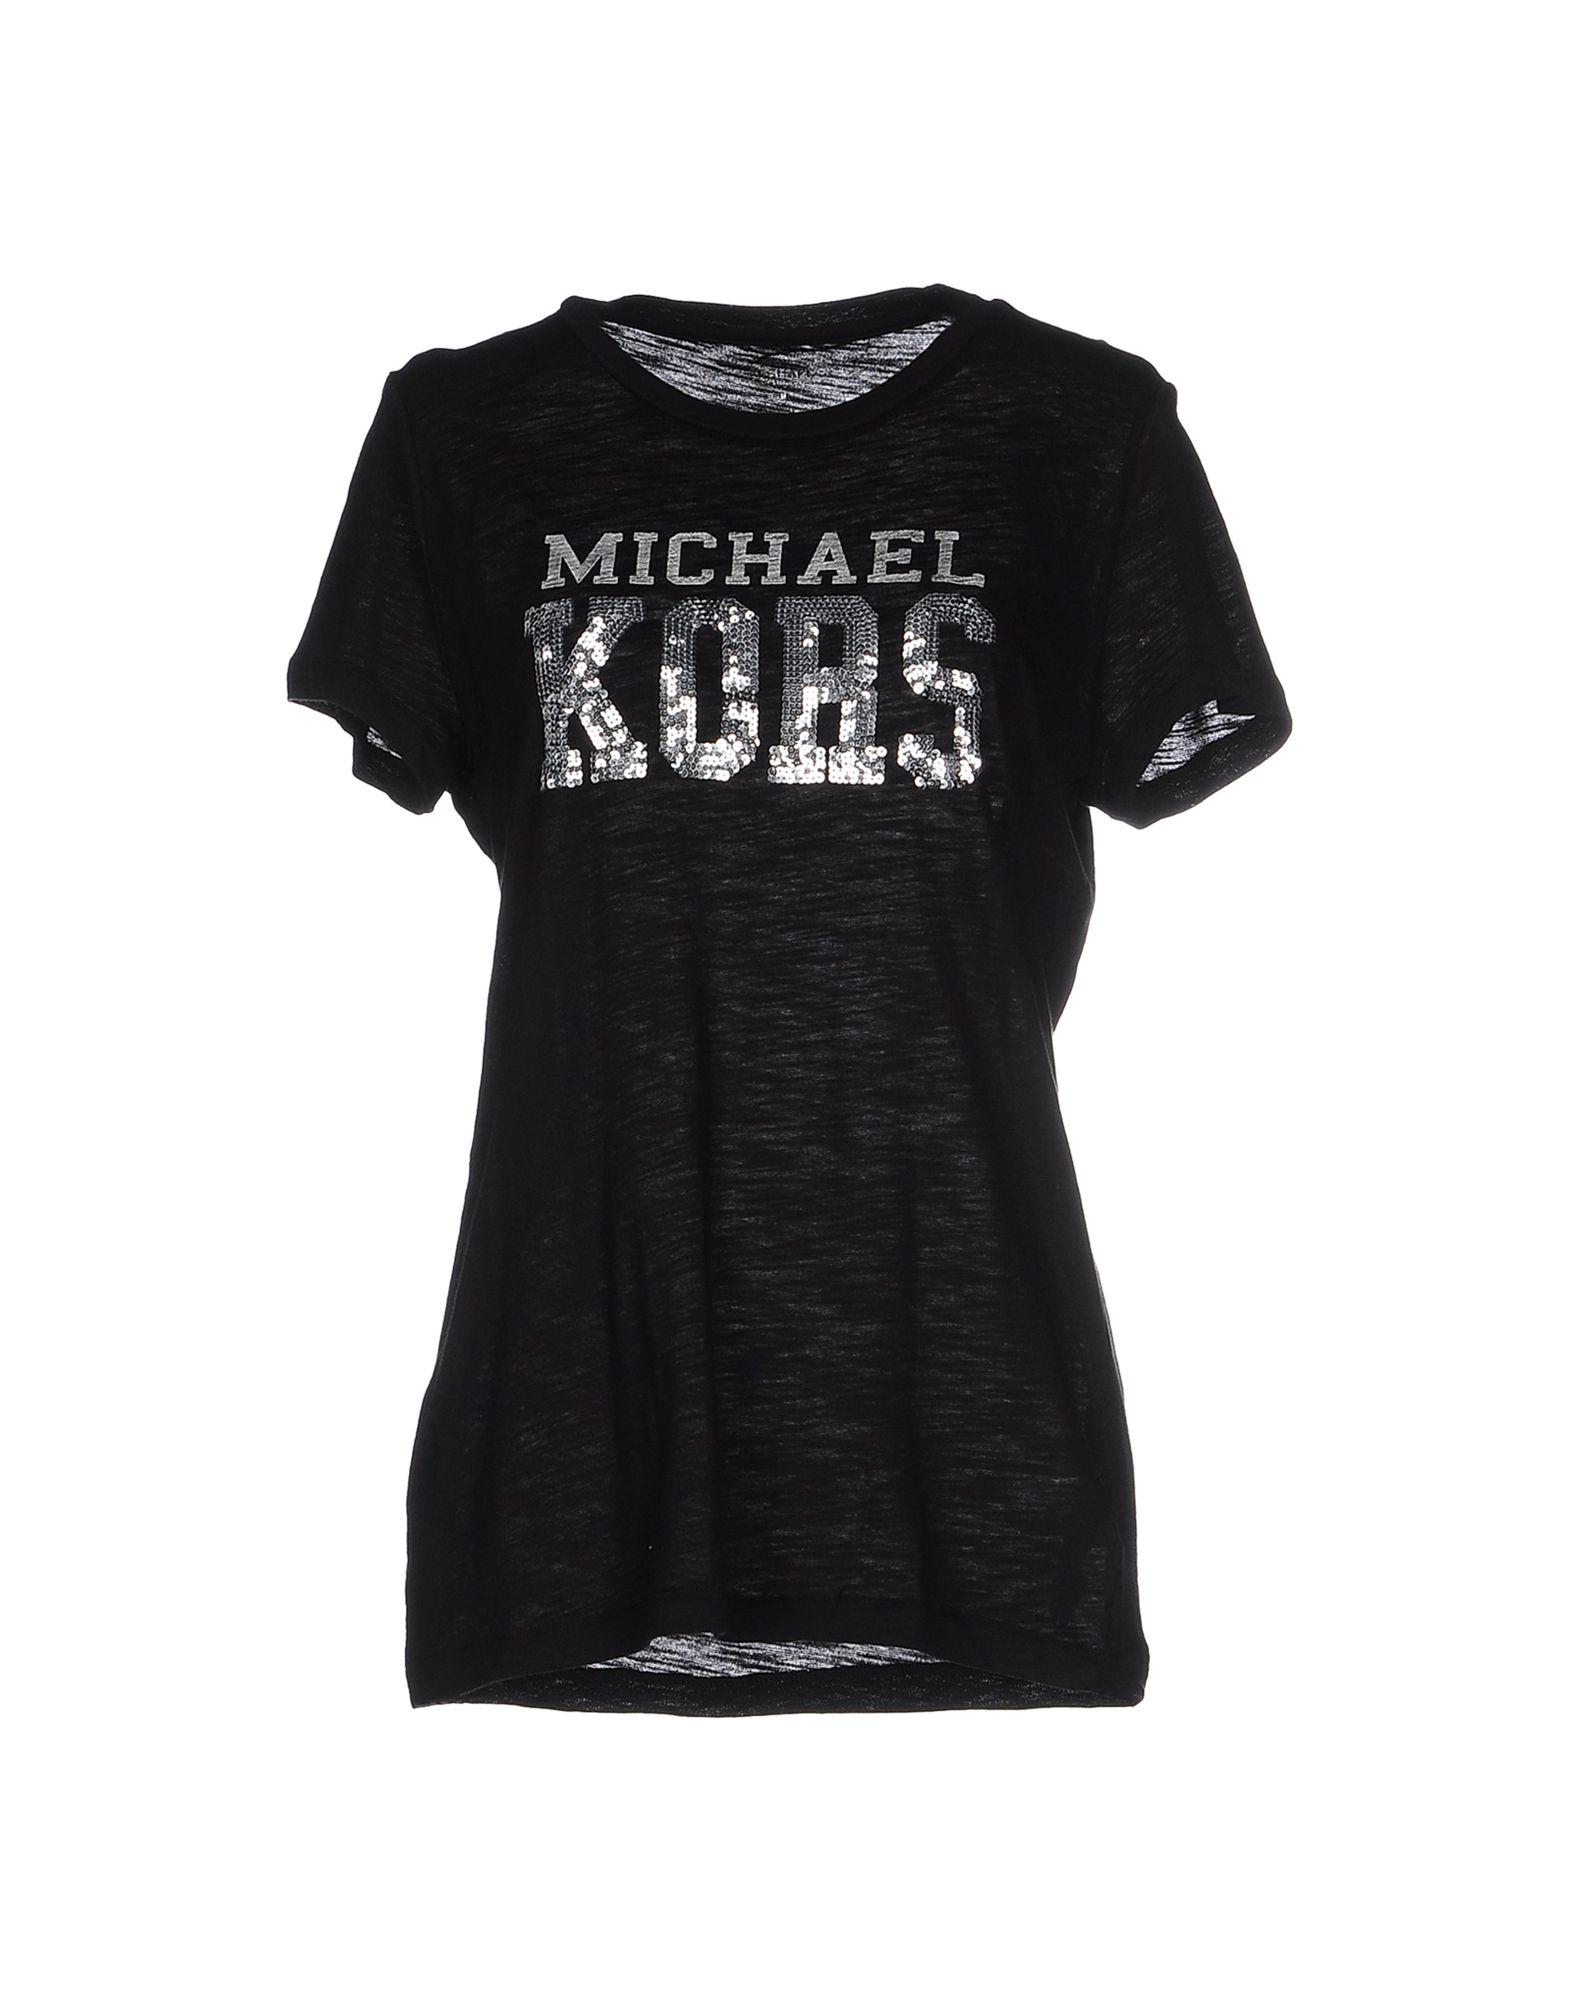 michael michael kors t shirt in black lyst. Black Bedroom Furniture Sets. Home Design Ideas